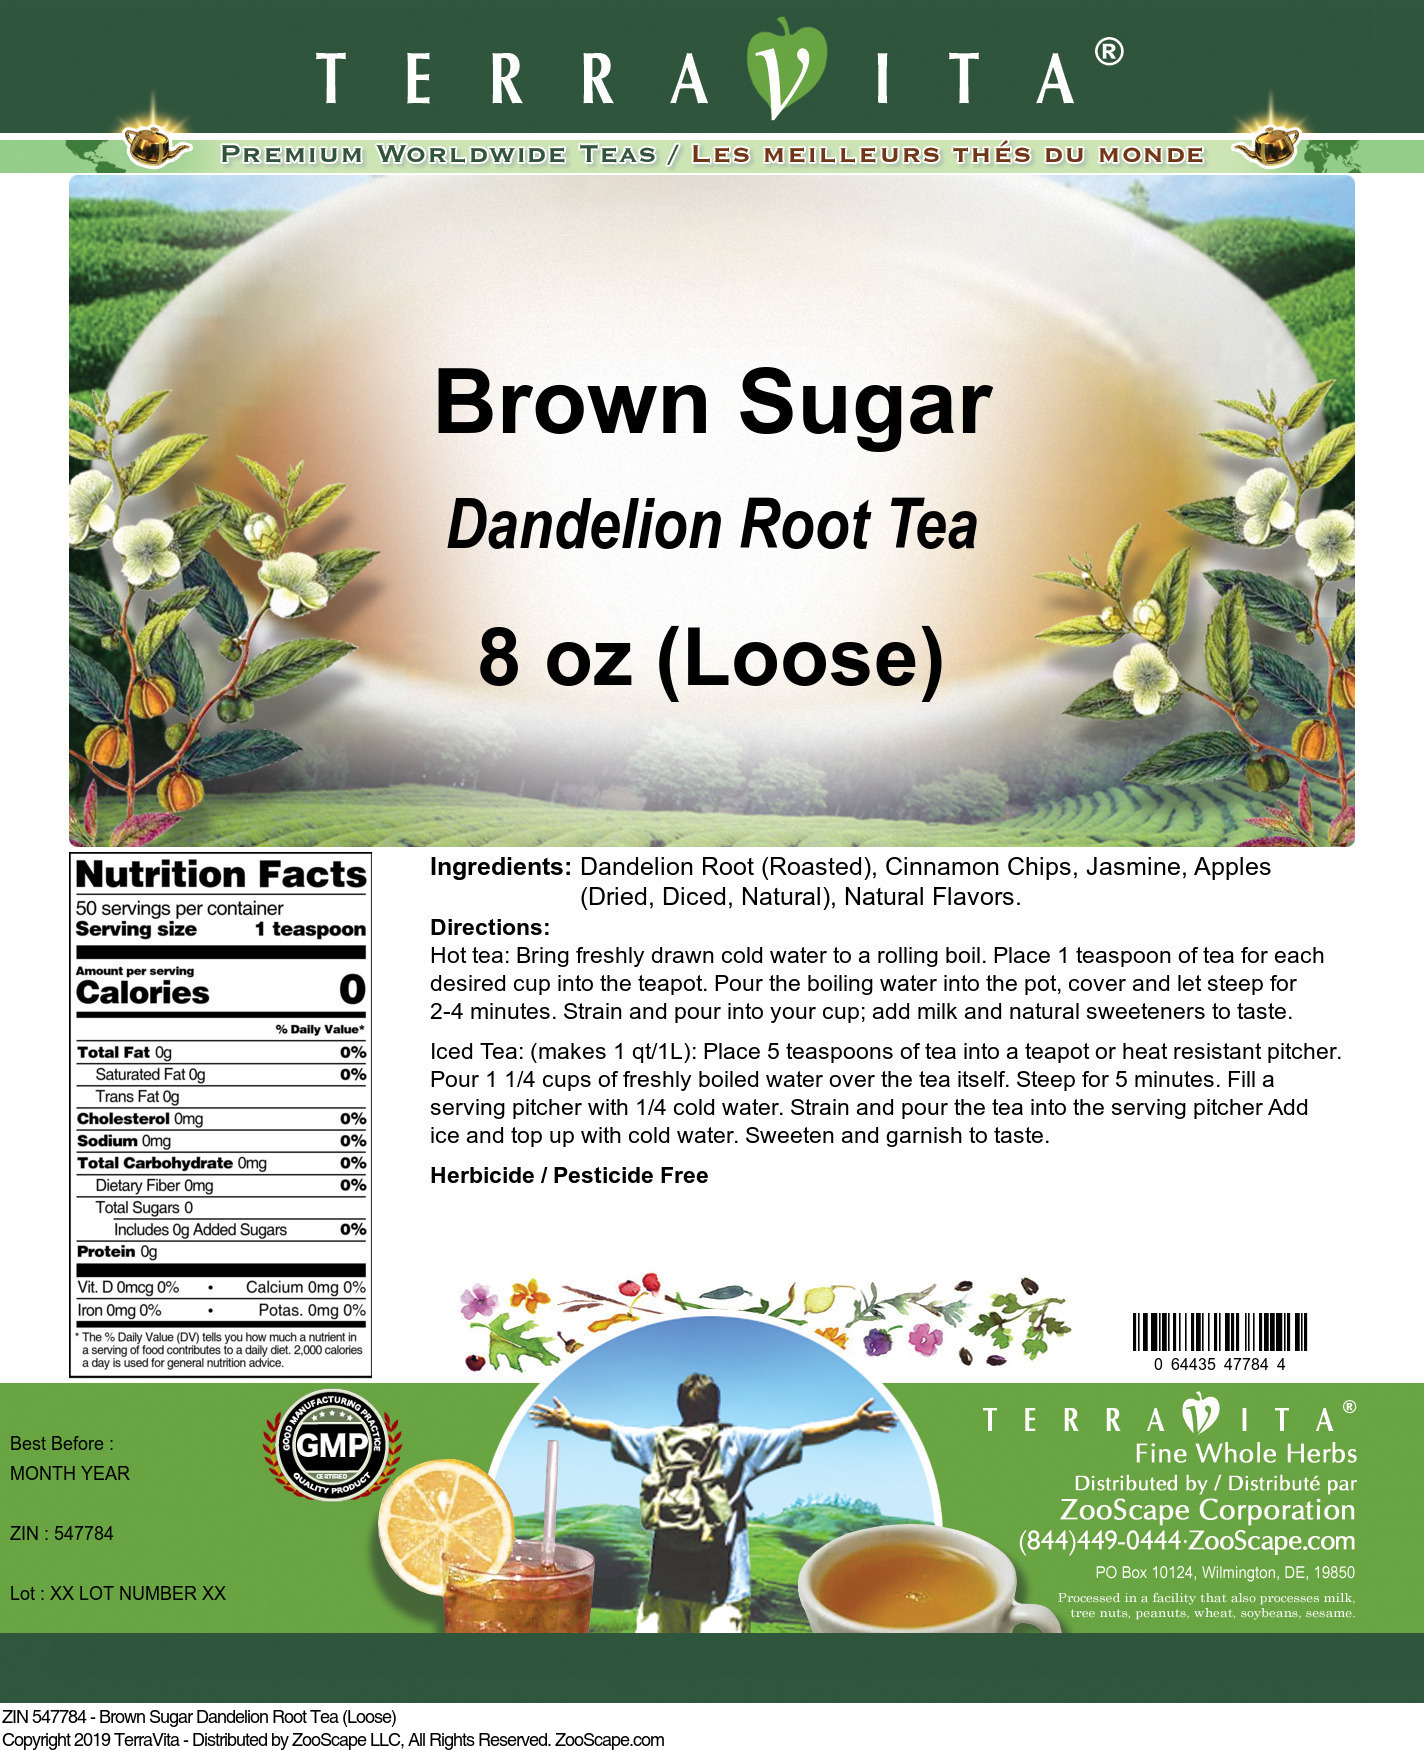 Brown Sugar Dandelion Root Tea (Loose)